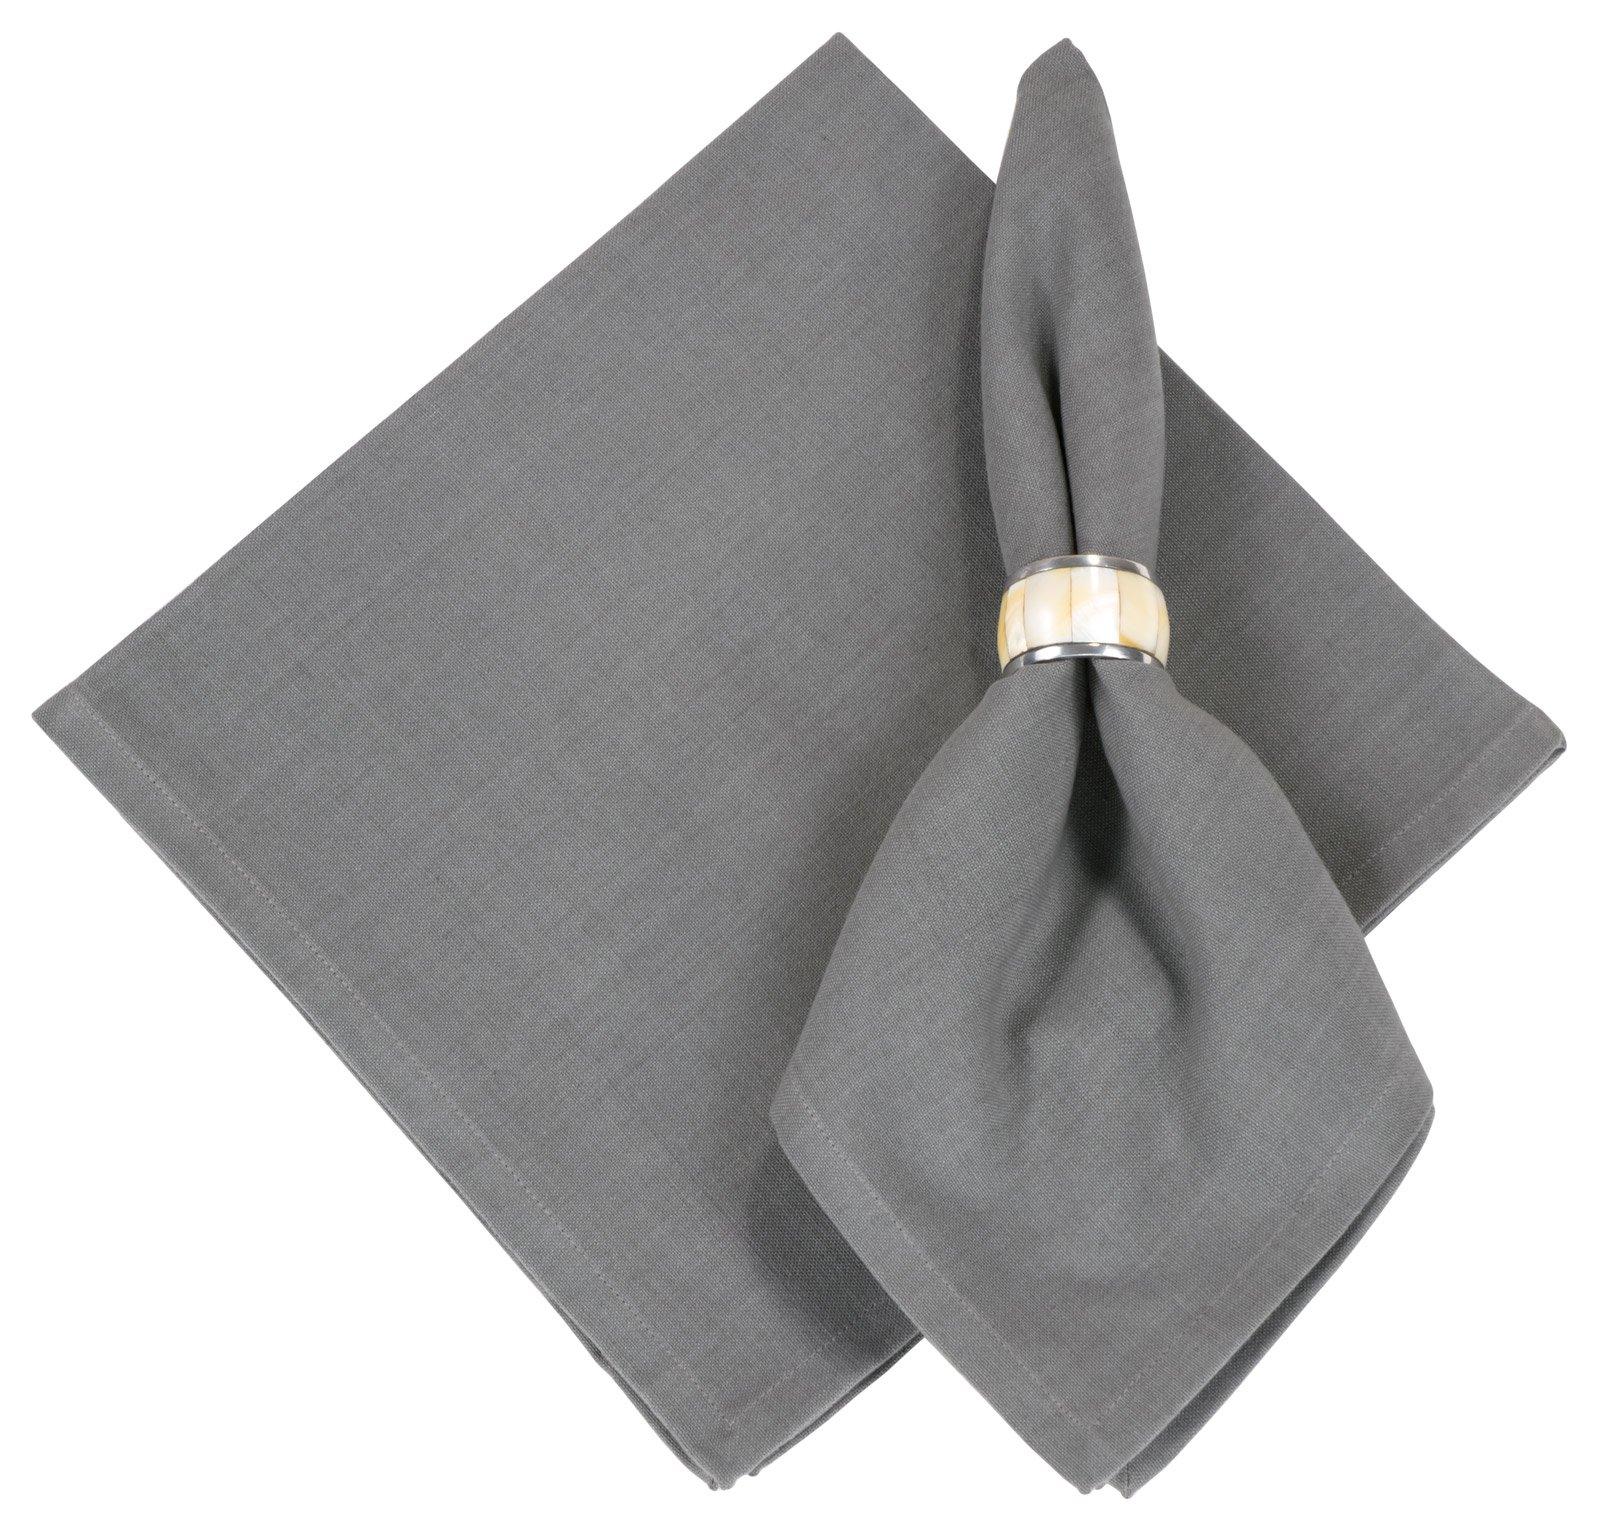 100% Cotton Solid Graphite Grey 22''x22'' Oversized Napkins, Set of 6